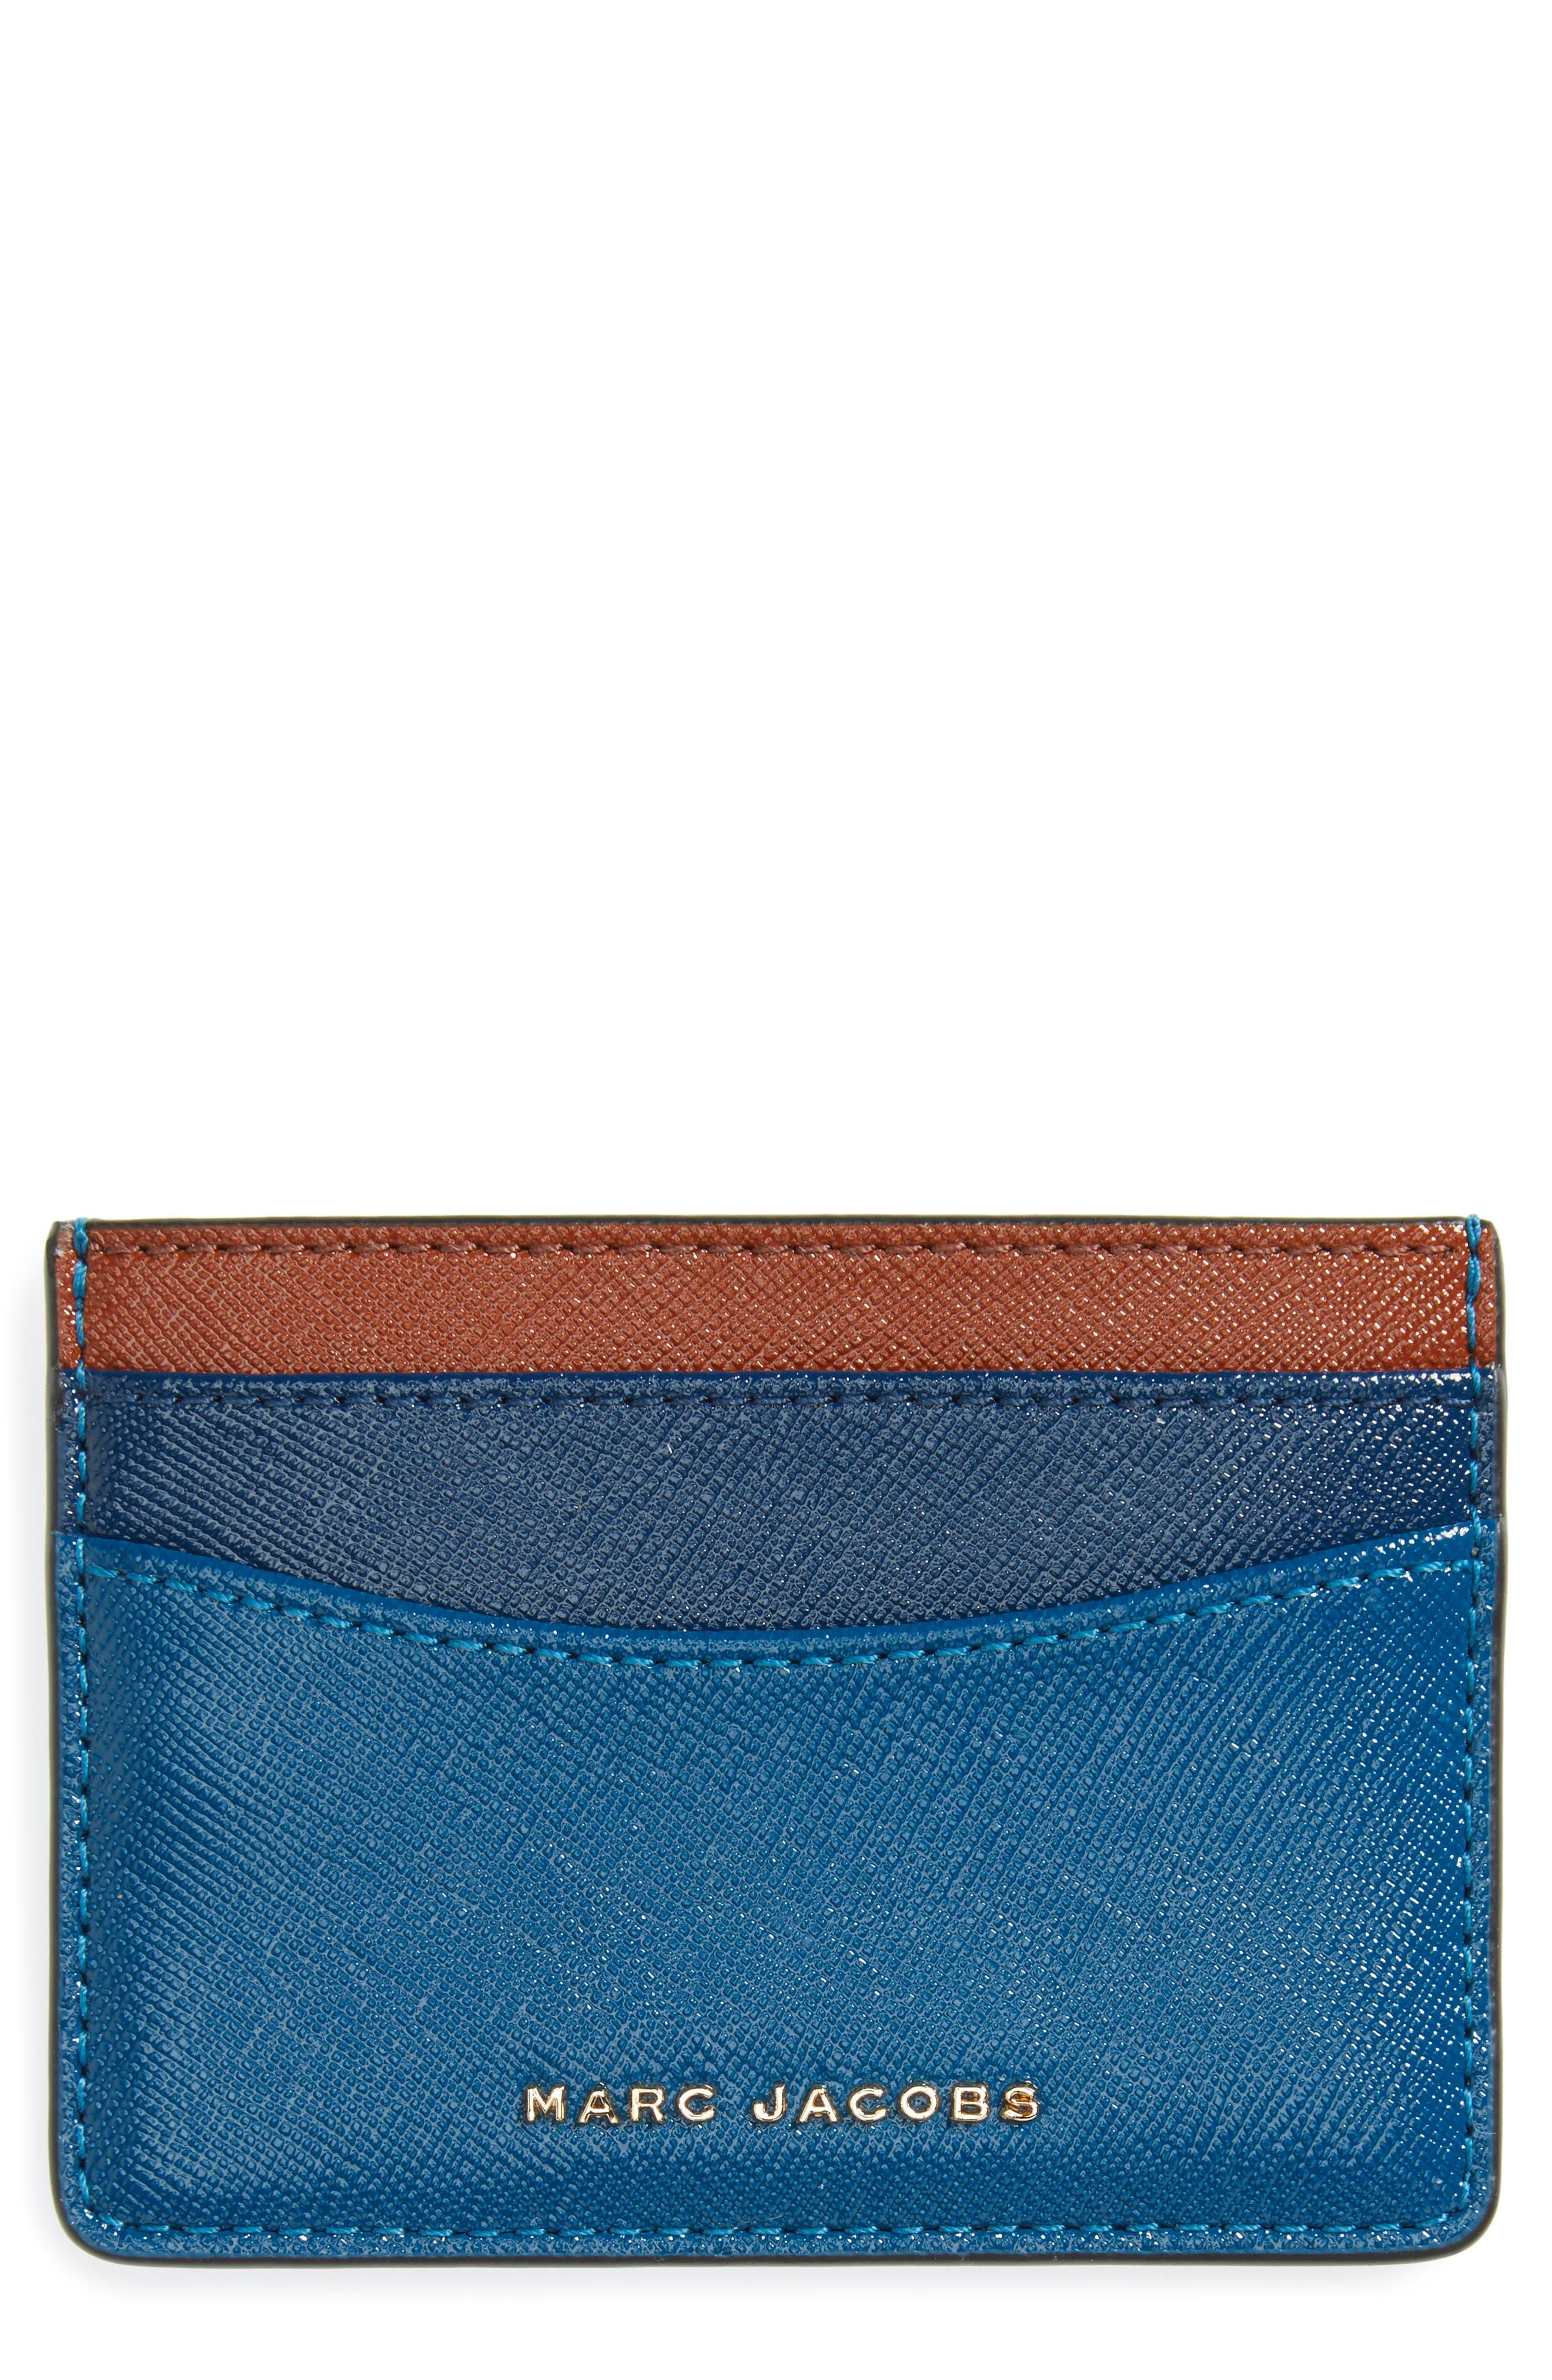 Color Block Saffiano Leather Card Case,                         Main,                         color, Bright Teal Multi